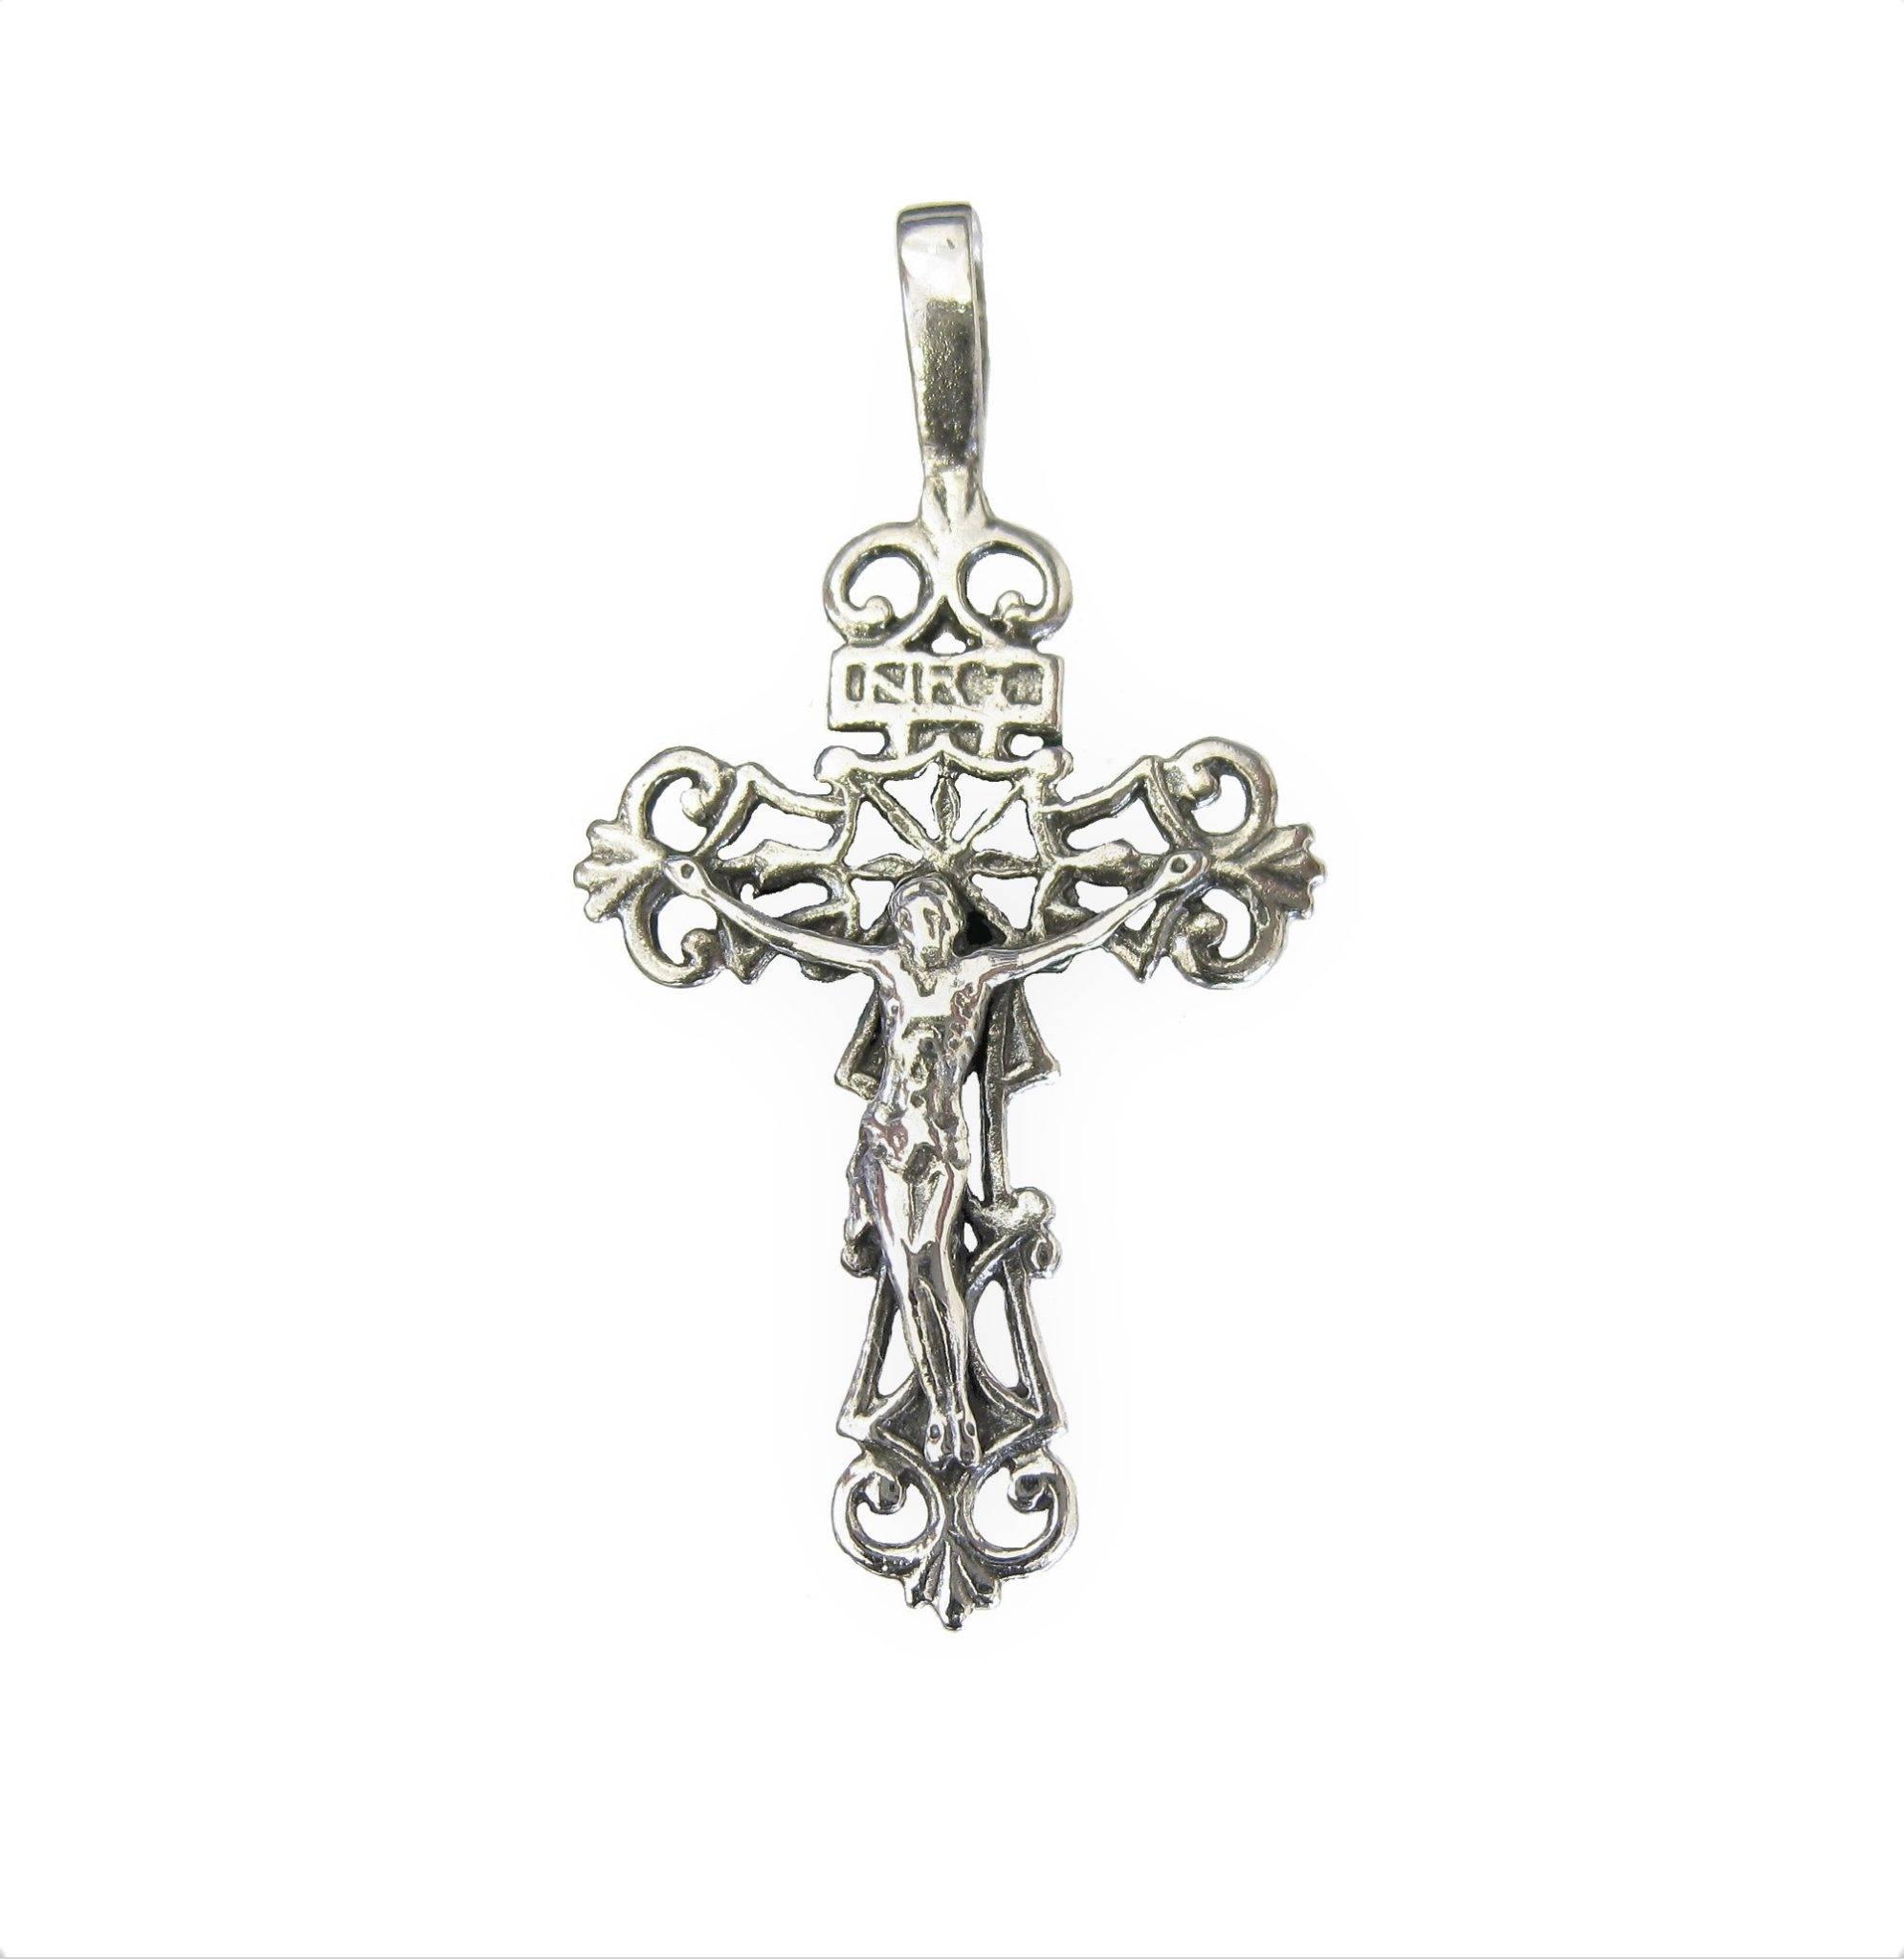 .925 Sterling Silver Eastern Orthodox Cross Charm Pendant MSRP $133